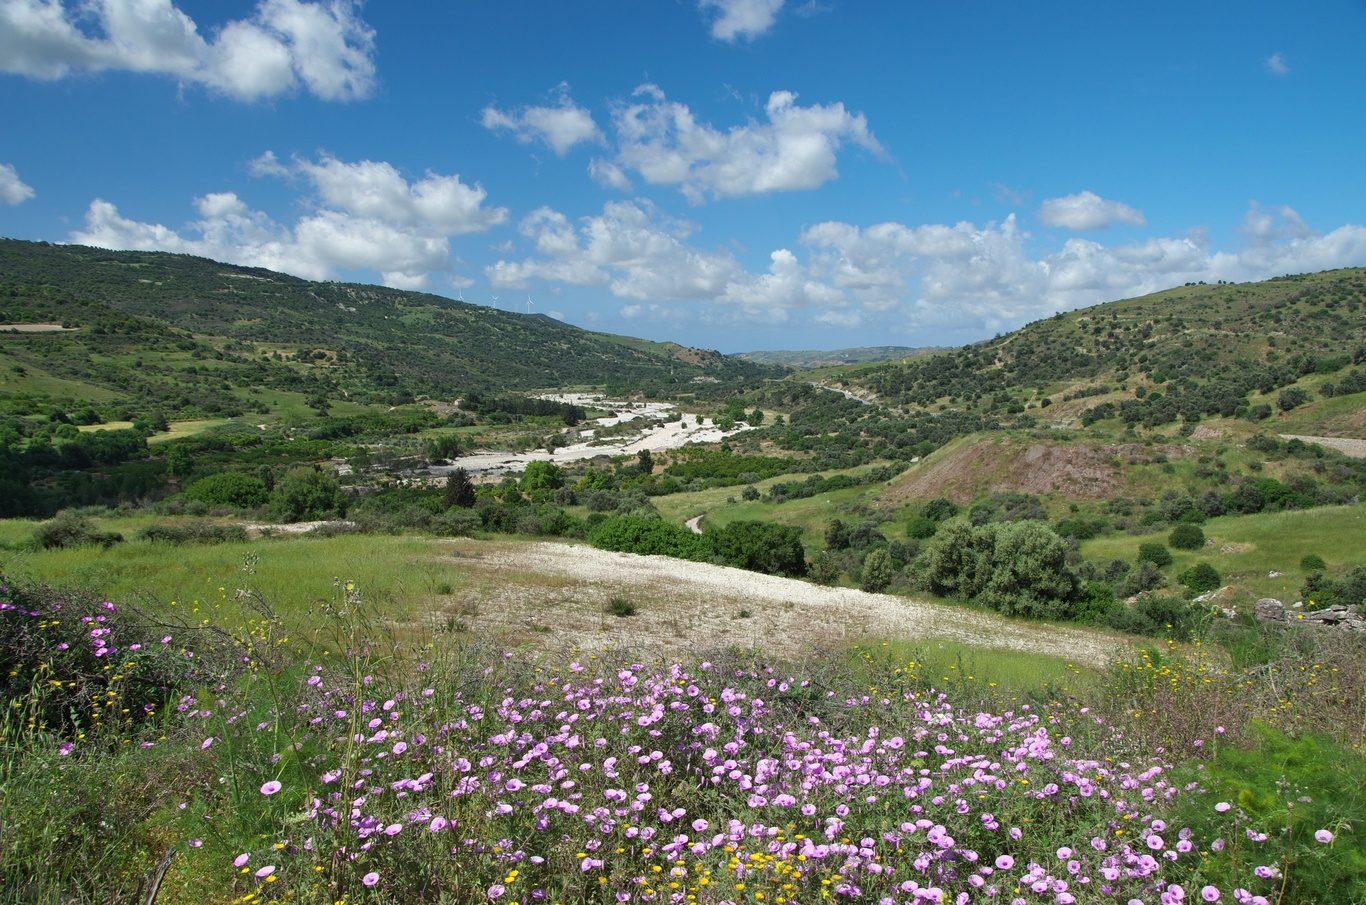 Údolí řeky Diarizos